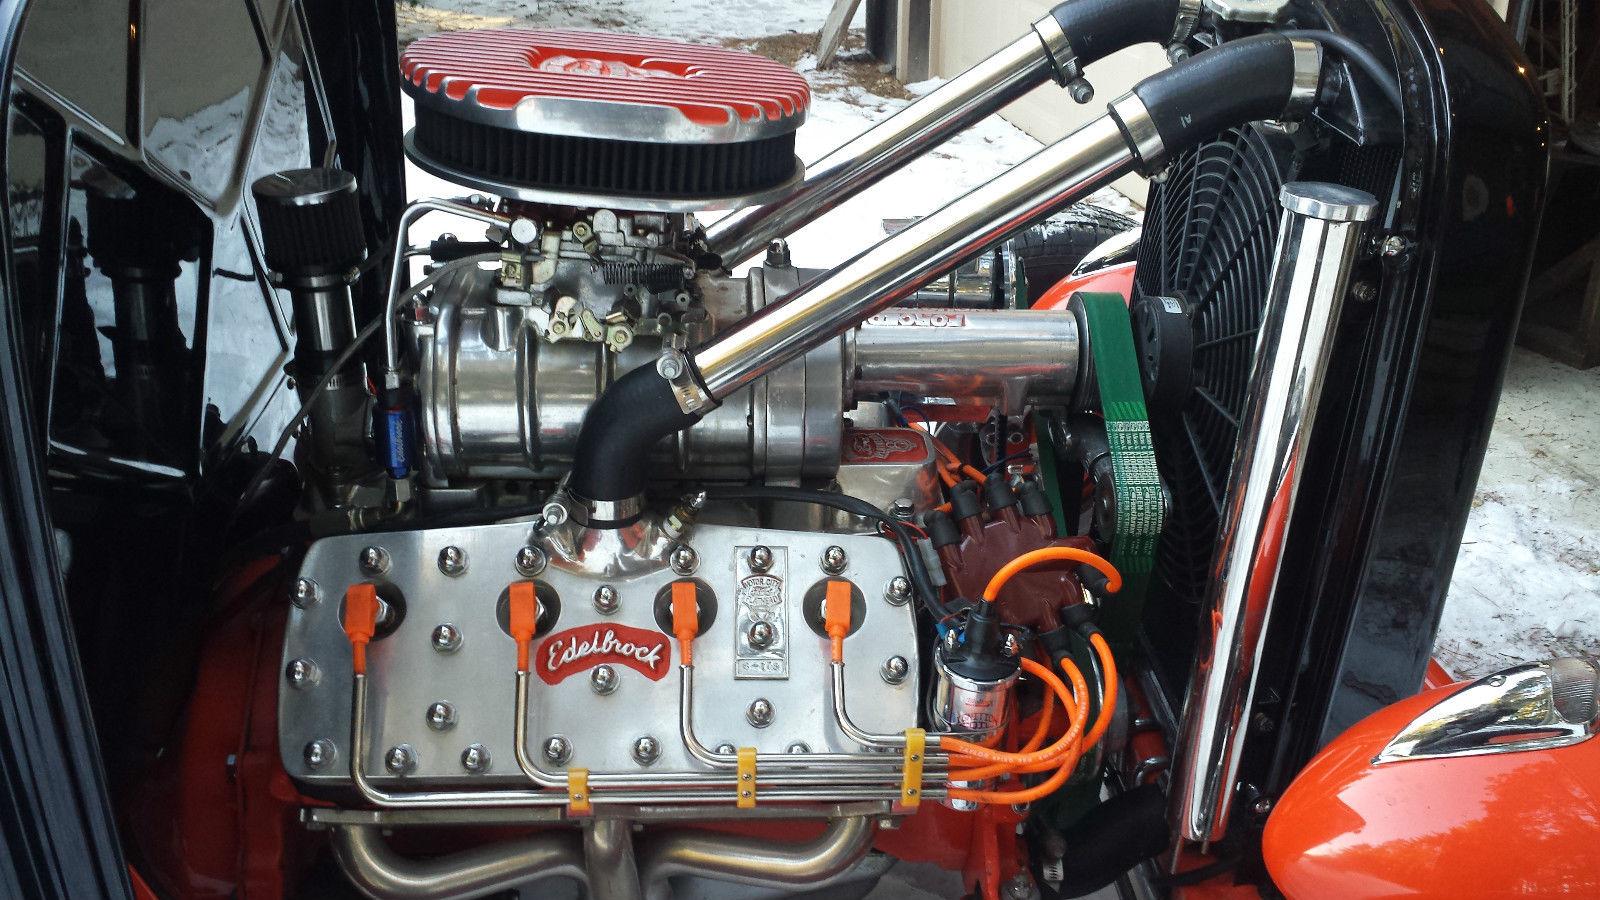 ford flathead wiring 1936 1932    ford    3 window coupe hotrod blown    flathead    5 speed  1932    ford    3 window coupe hotrod blown    flathead    5 speed